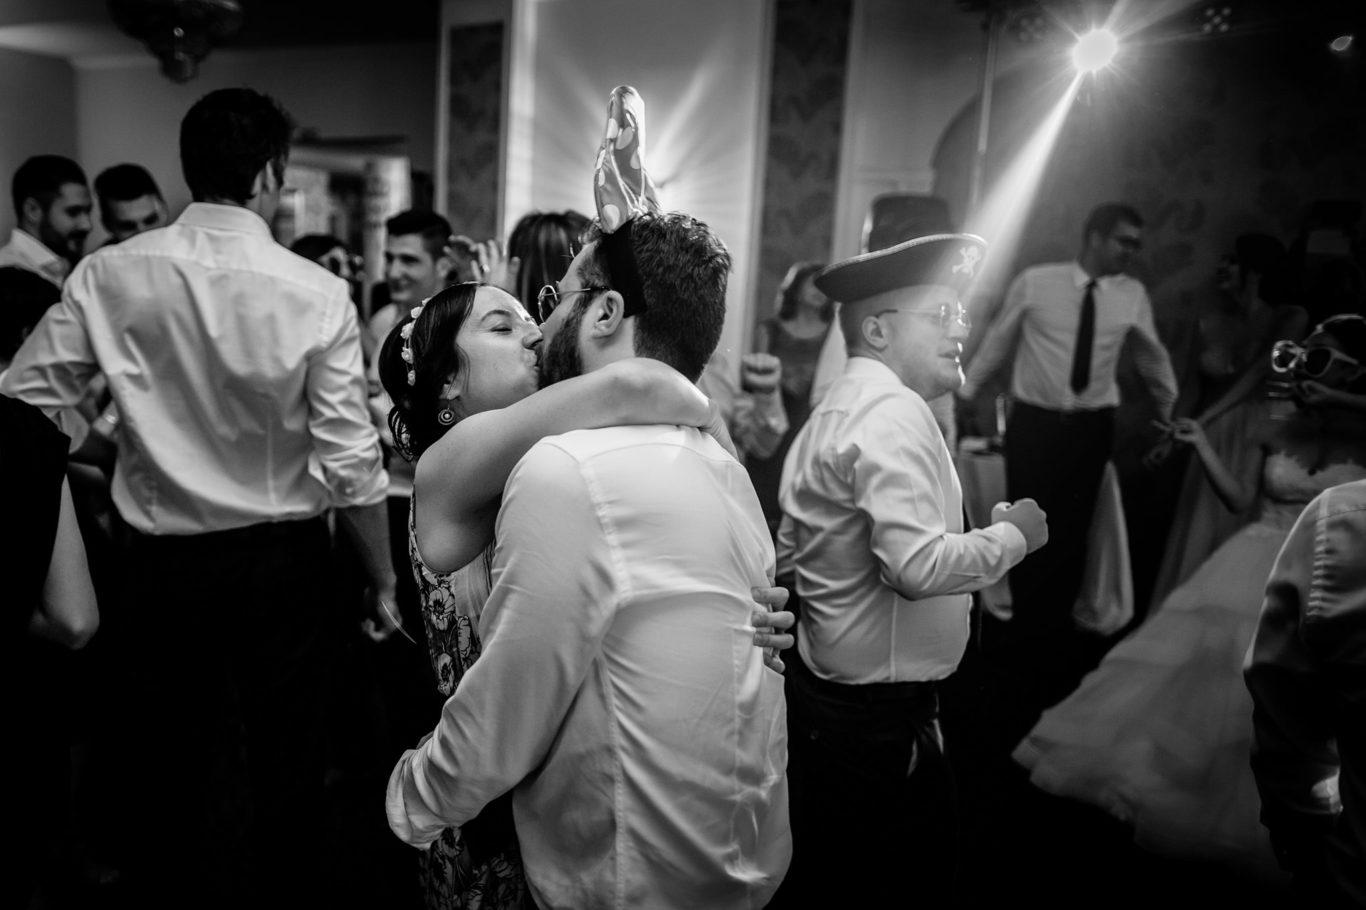 0654-fotografie-nunta-bucuresti-cristina-nicusor-fotograf-ciprian-dumitrescu-dc1_0403